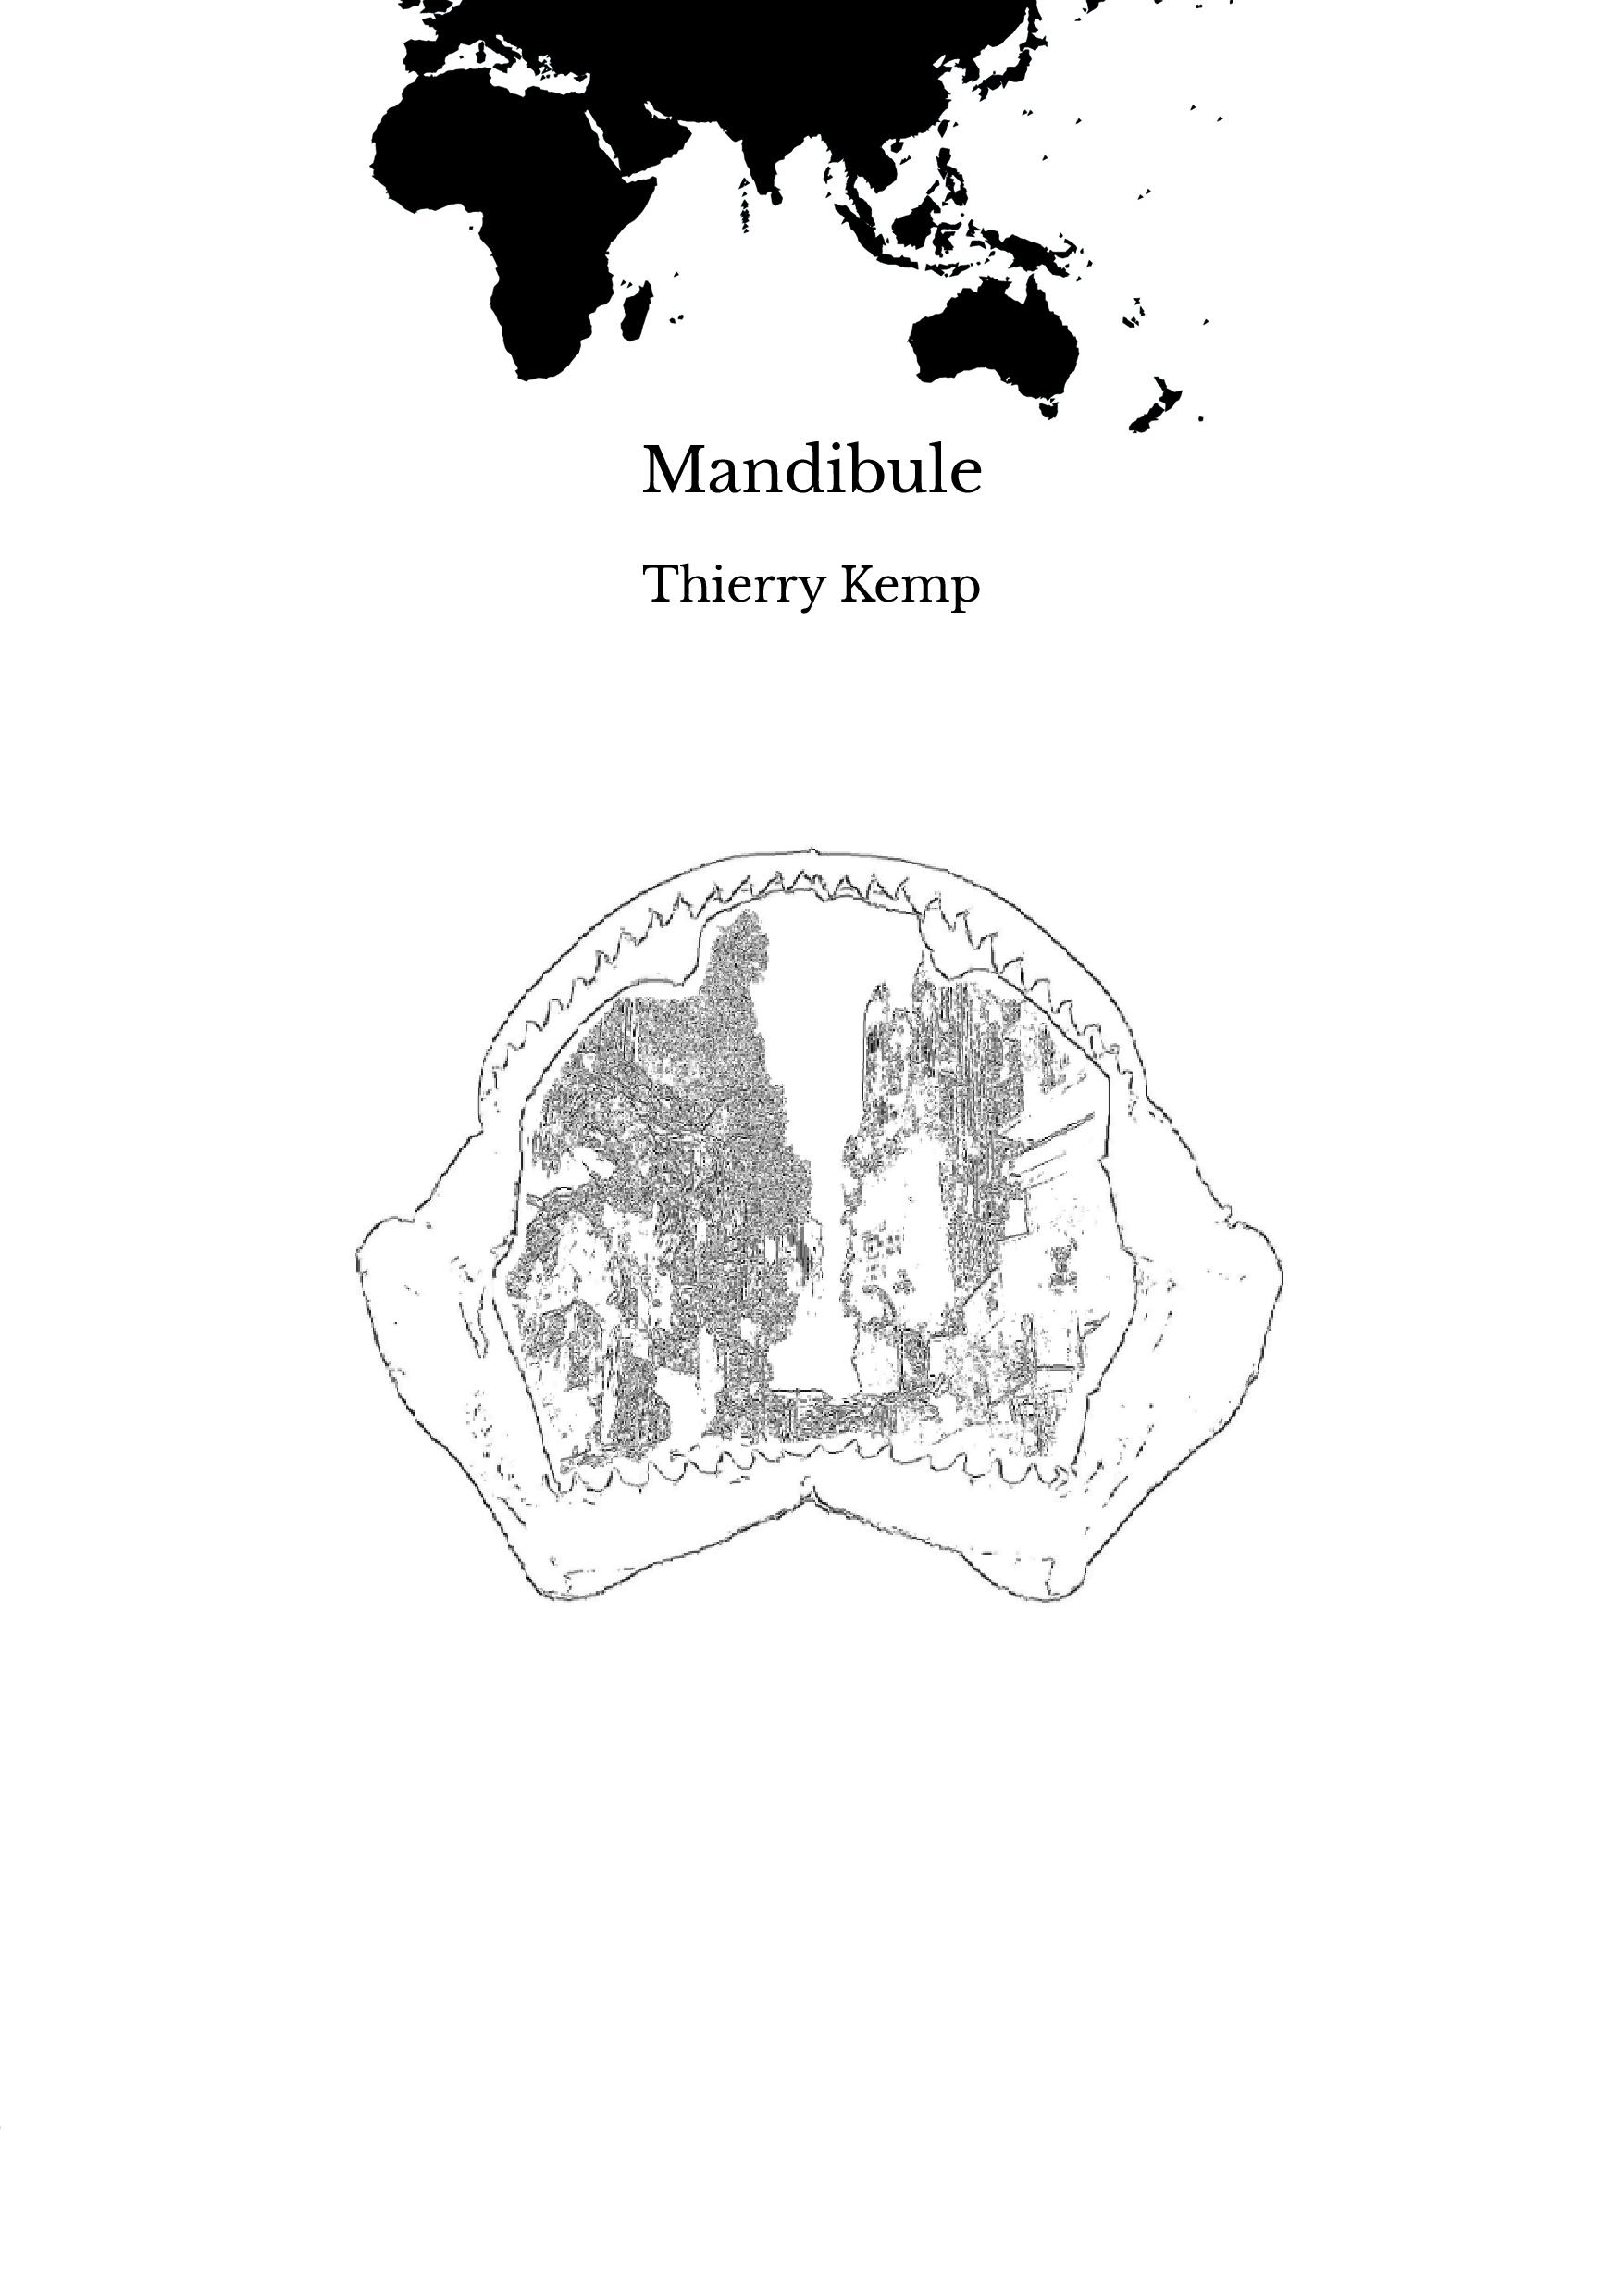 Mandibule